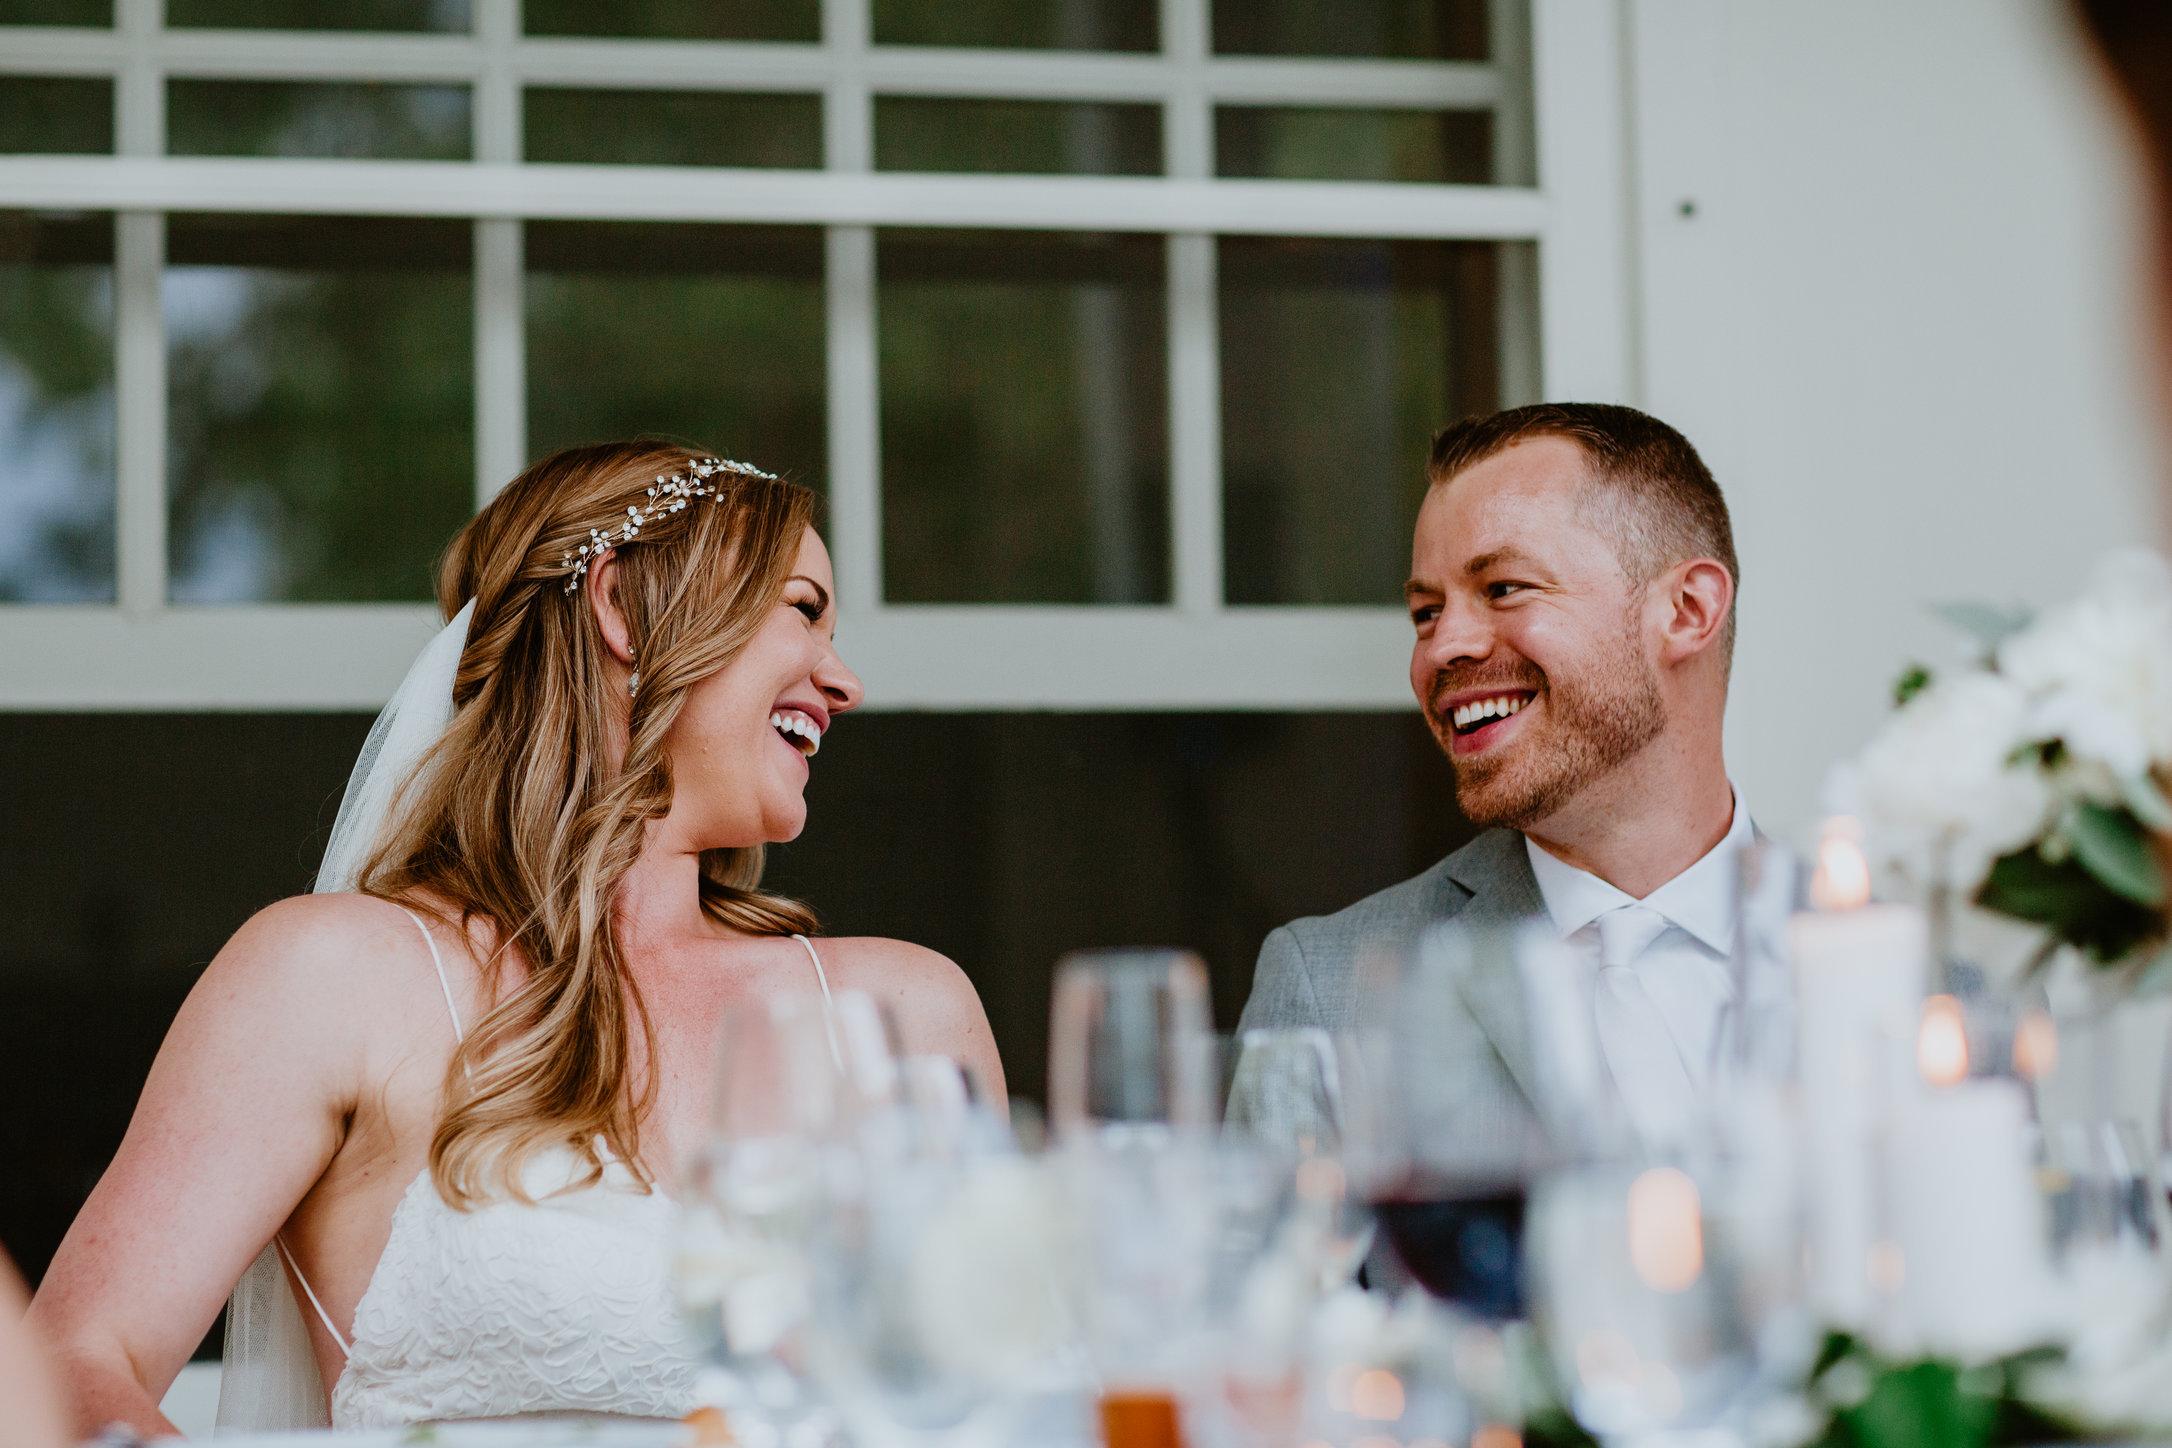 DandA-wedding-603.jpg